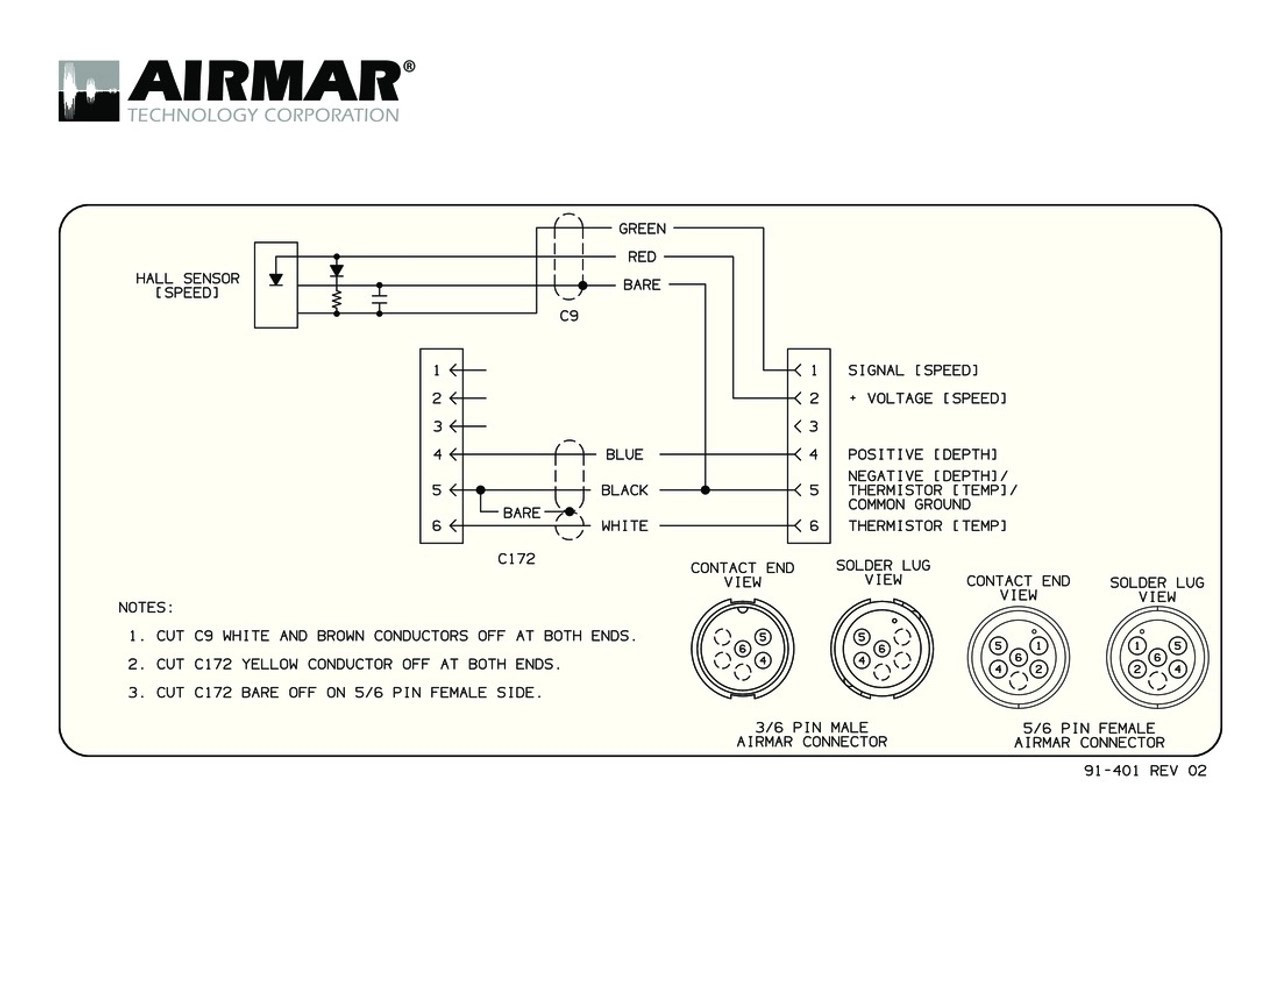 hight resolution of airmar wiring diagram garmin 6 pin s blue bottle marine garmin transducer wiring diagram 4 pin